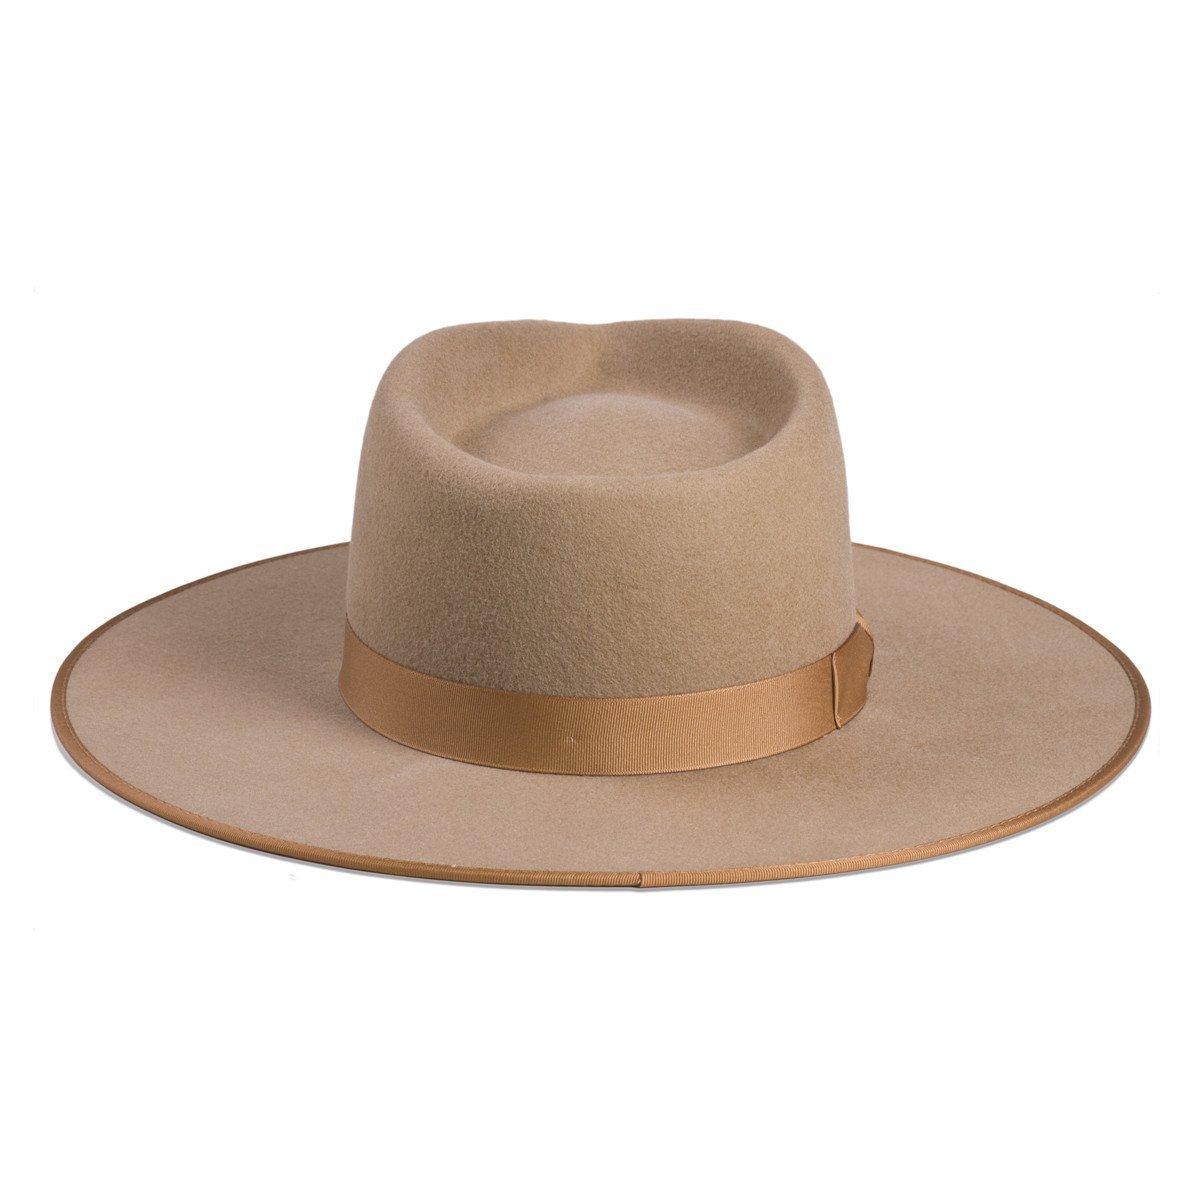 Lack of Color Women's Teak Rancher Wool Felt Fedora Light Brown MD (57cm) by Lack of Color (Image #2)